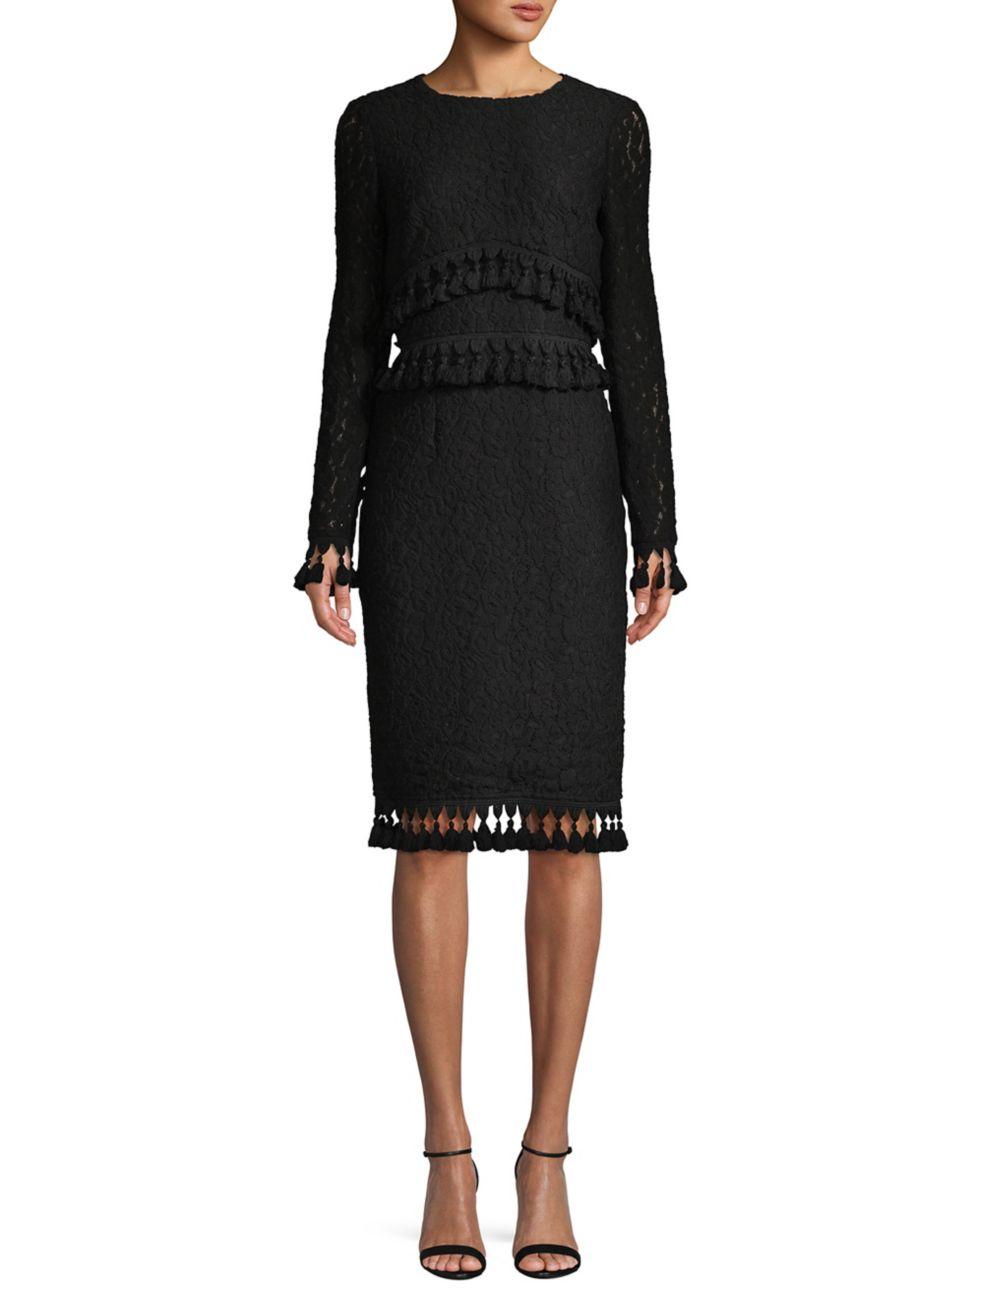 Classic Tassel-Trimmed Dress - $550 | $385 on SALE with code: FRIENDS, Badgley Mischka Platinum.